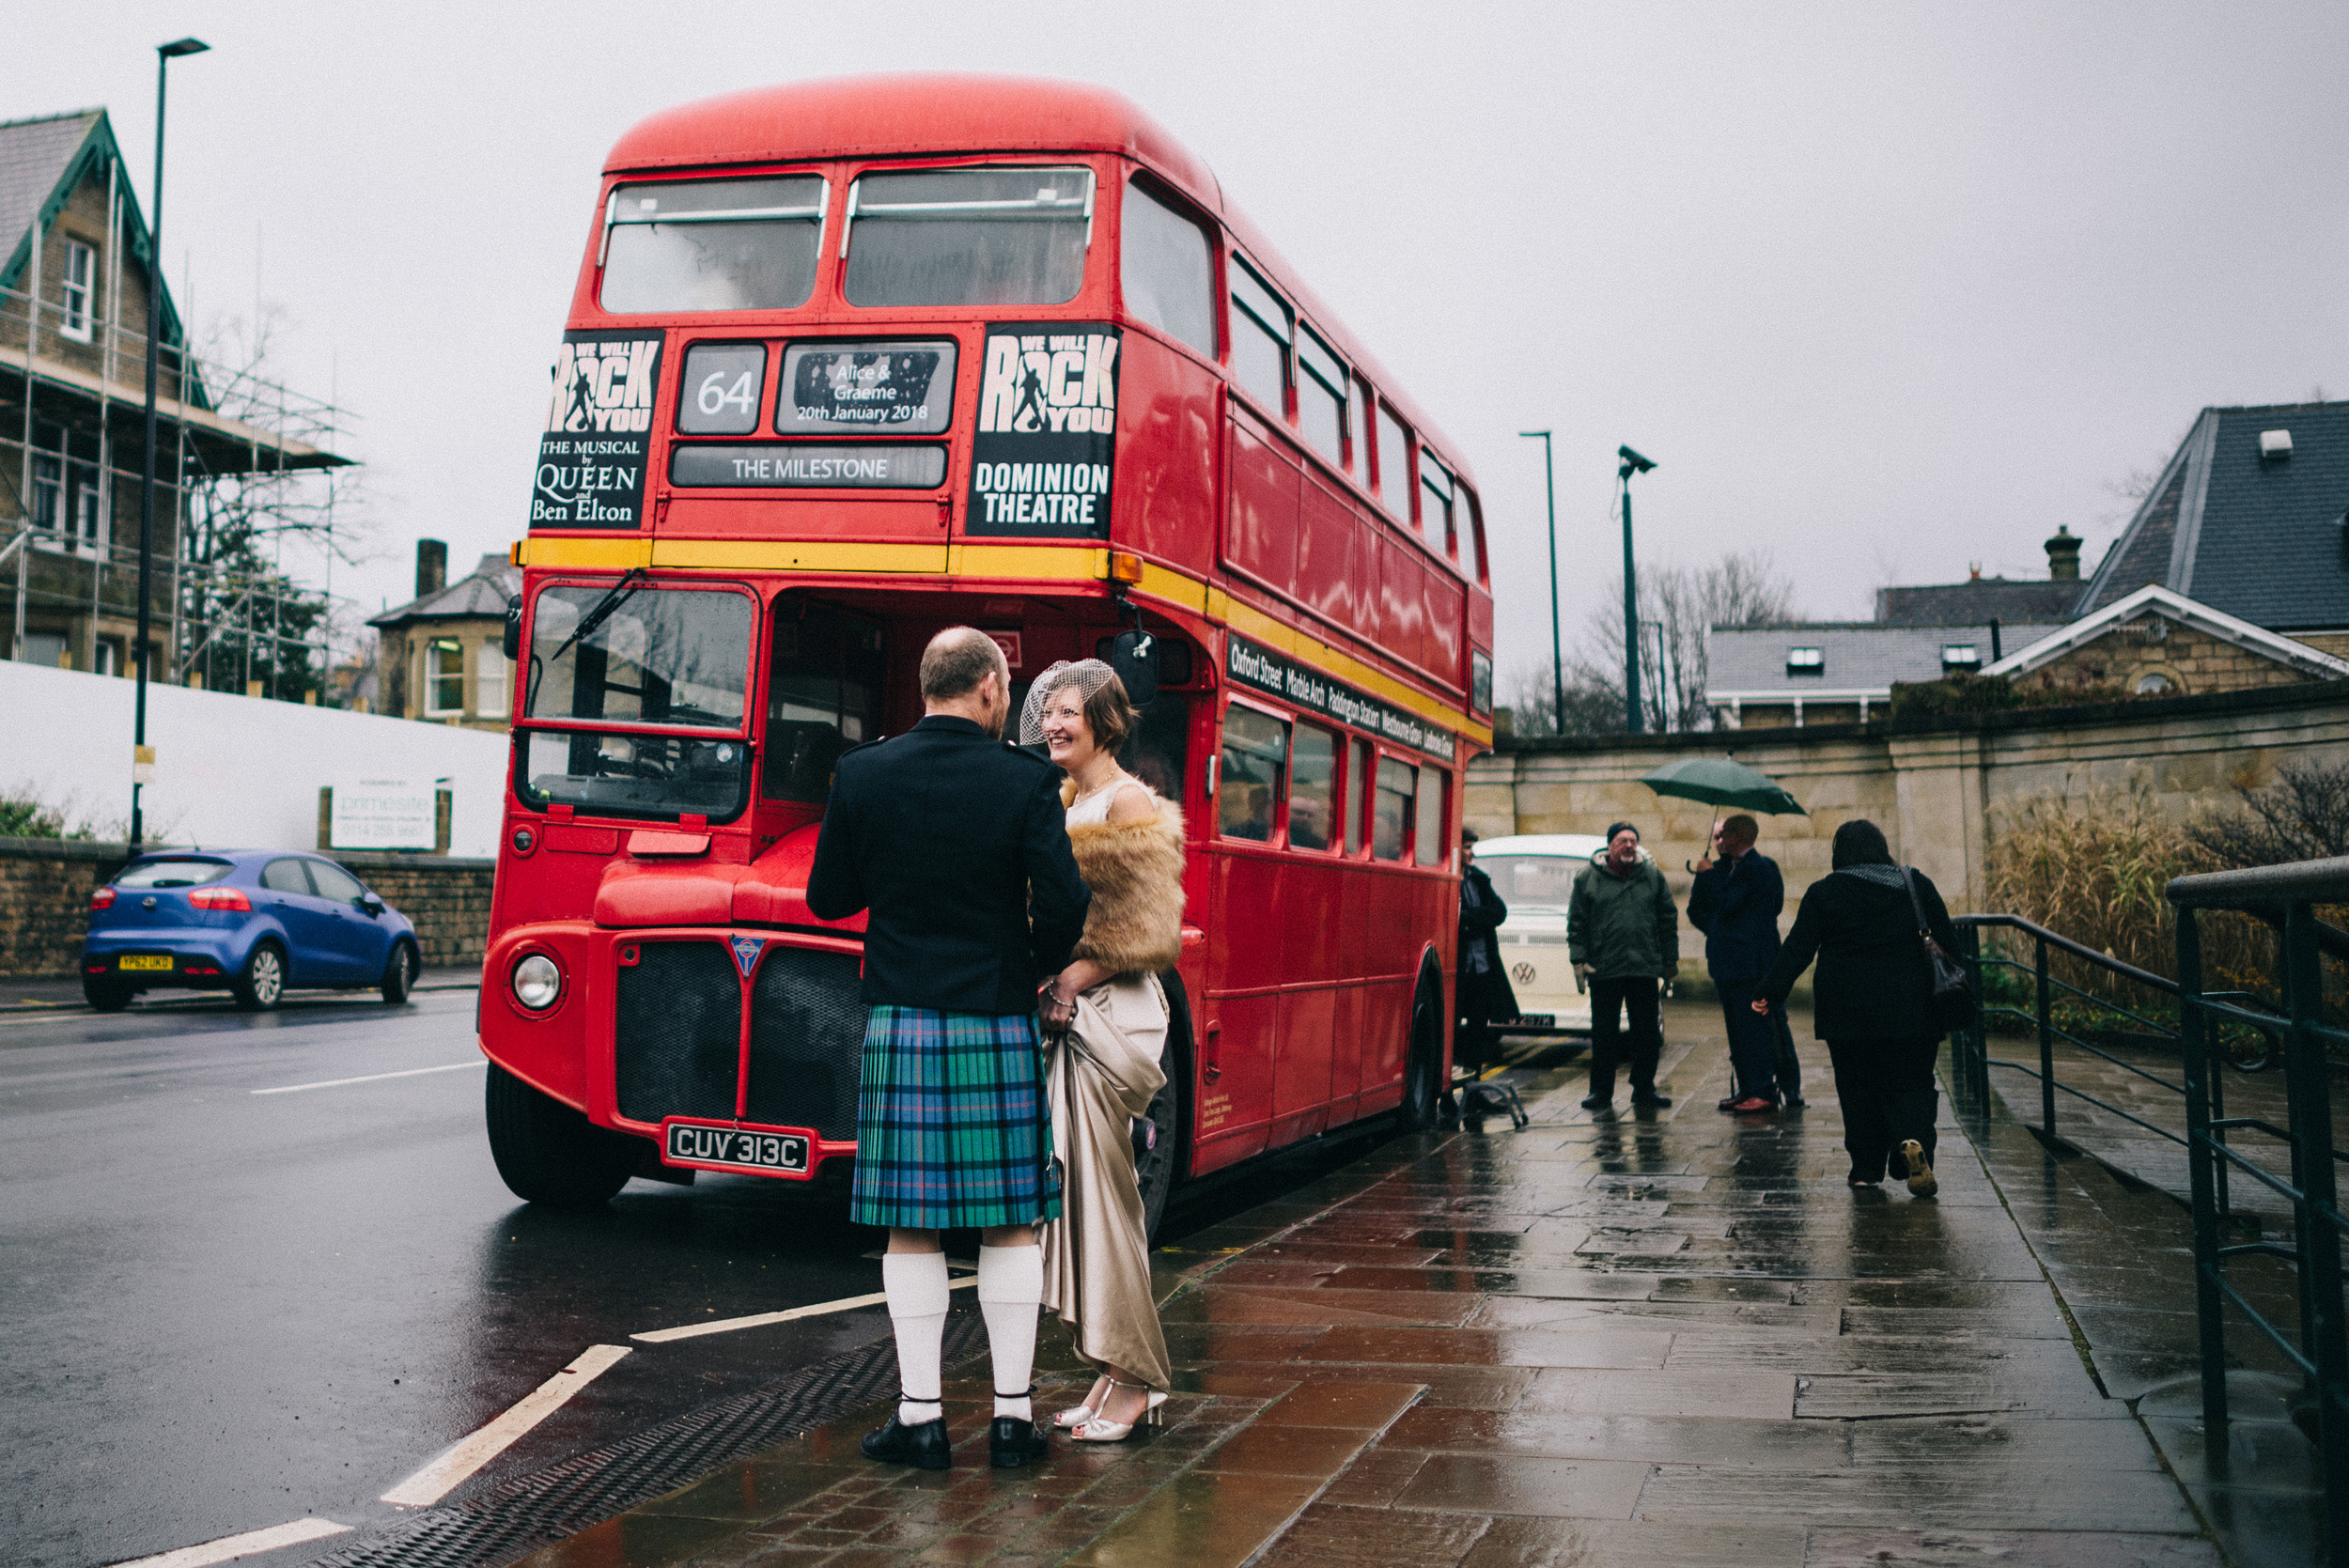 Alice-Bias-Cut-Silk-Wedding-Dress-Kate-Beaumont-Sheffield-Botanical-Gardens-by-Peakography-18.jpg